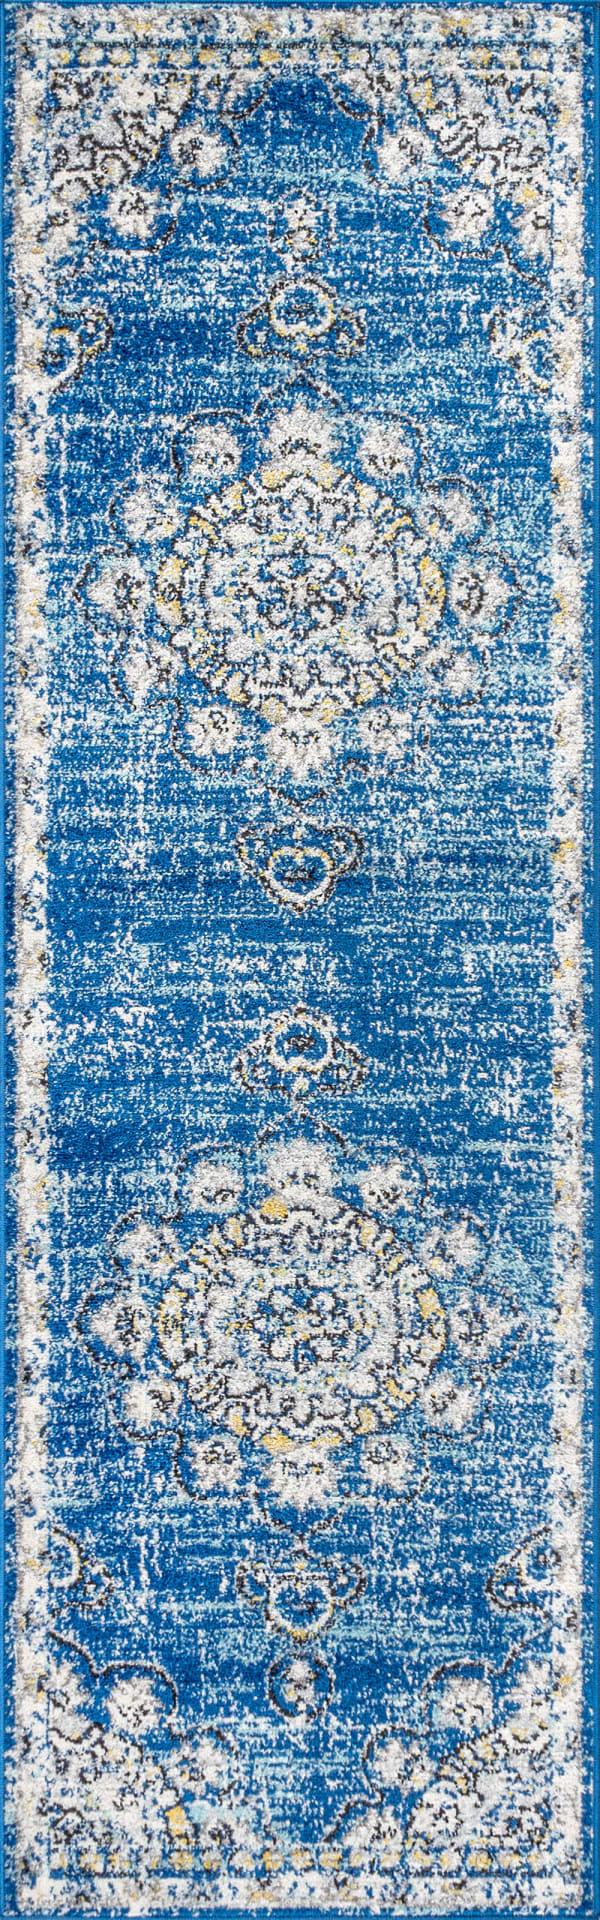 Bohemian FLAIR Boho Vintage Medallion Blue/Cream 2.25' x 8' Runner Rug